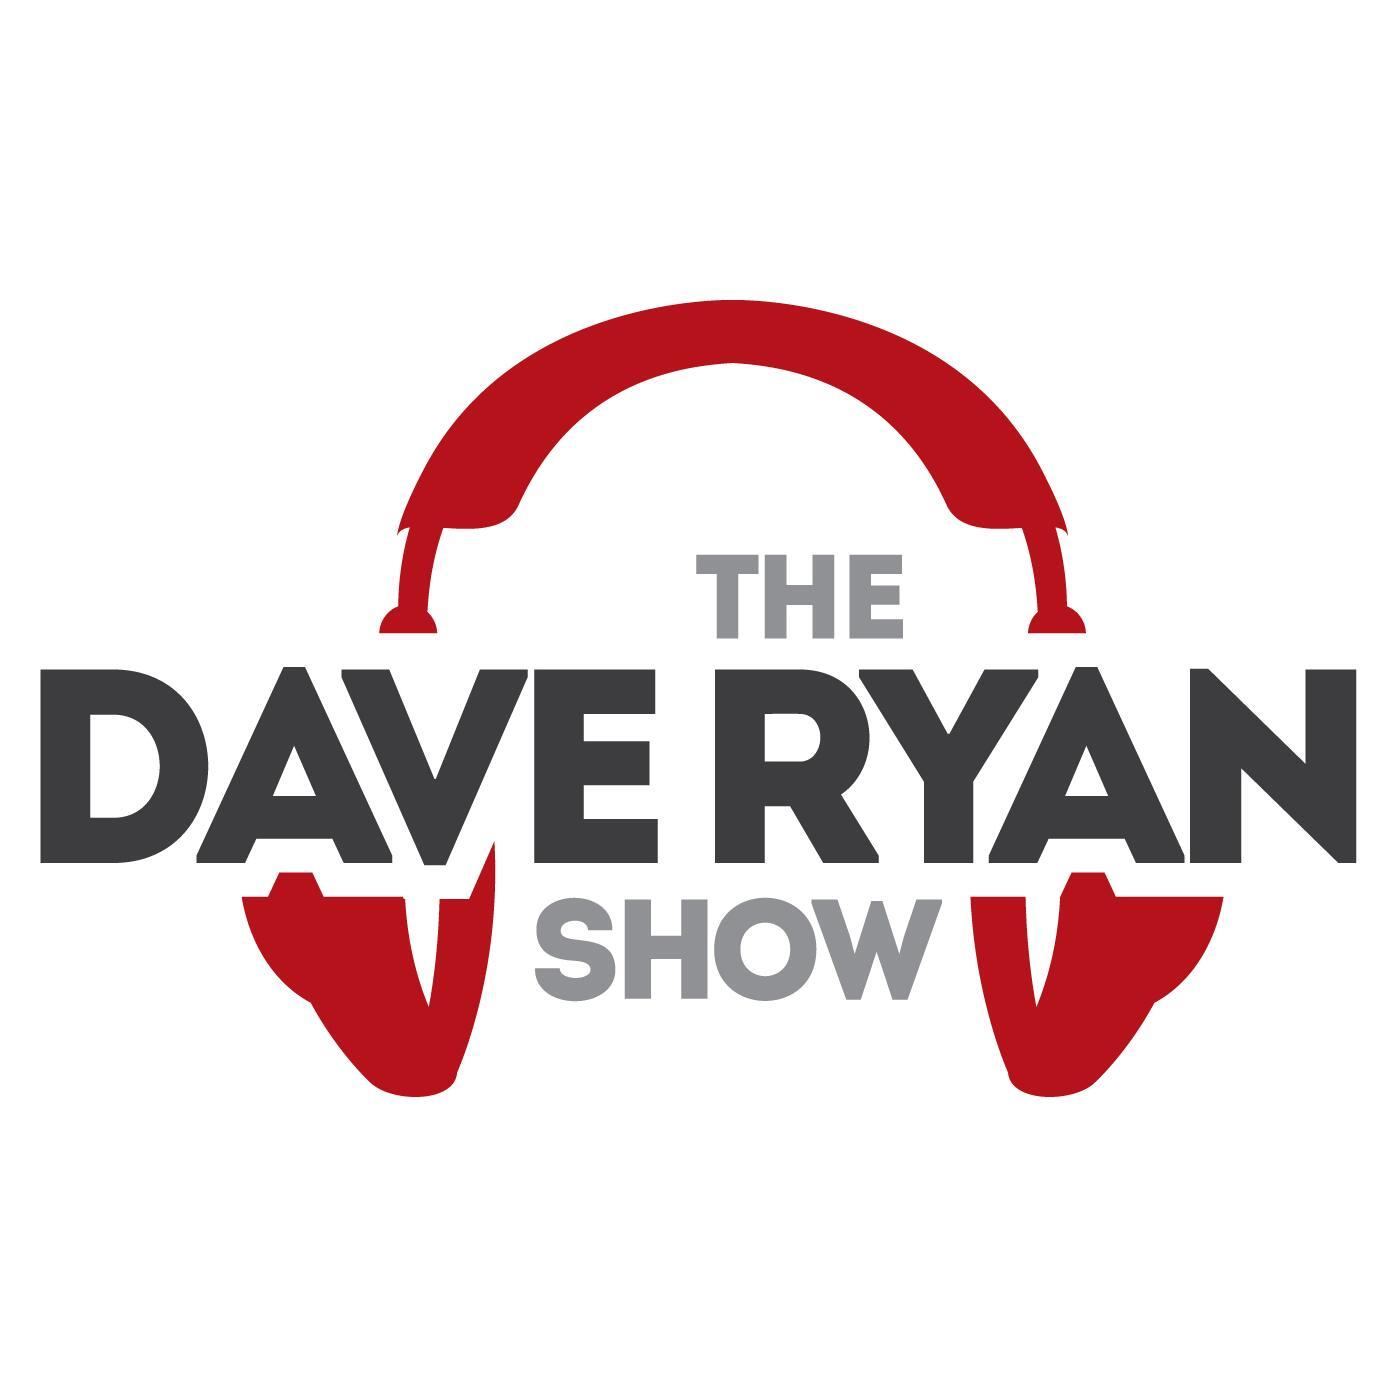 The Dave Ryan Show Parodies